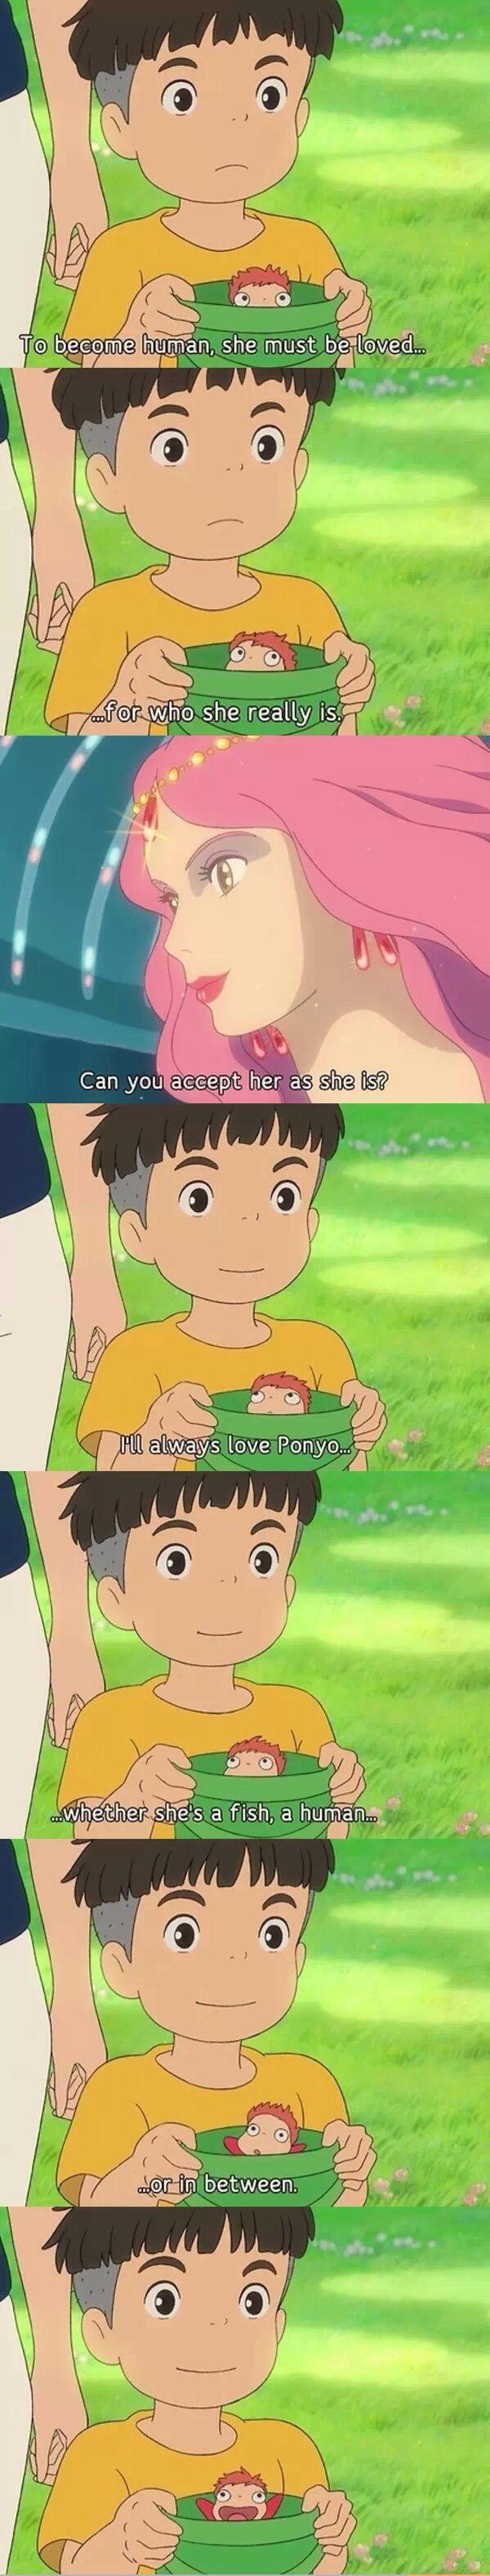 Sousuke's love confession. -- Studio Ghibli movies, Ponyo, Miyazaki, Japanese films, moments, quotes, scenes, cute, adorable